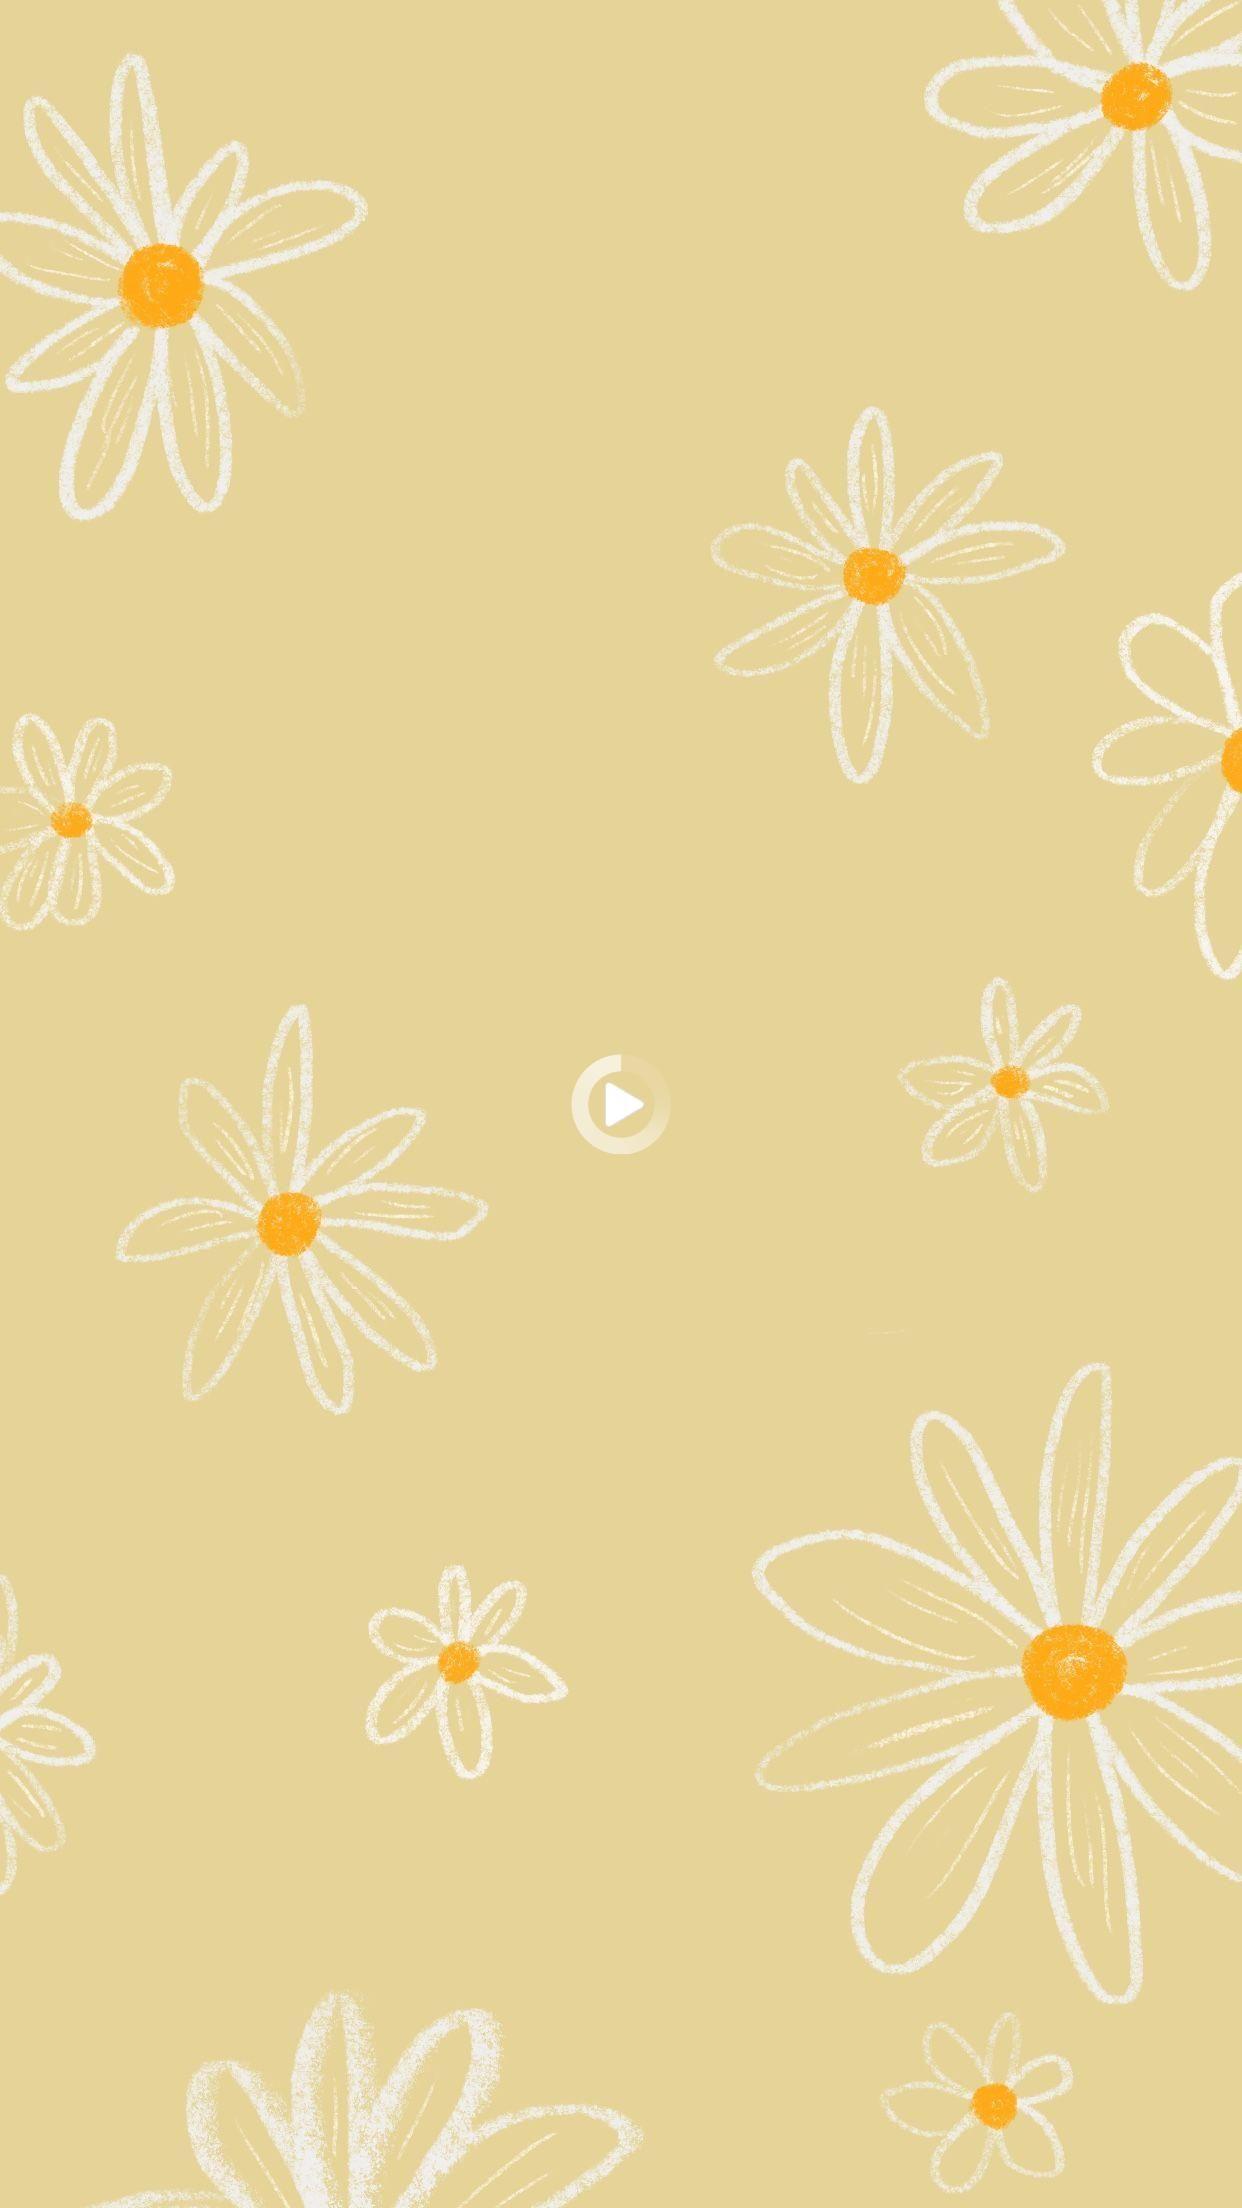 Redirecting In 2021 Wallpaper Iphone Boho Phone Wallpaper Boho Iphone Wallpaper Yellow Aesthetic yellow iphone wallpaper